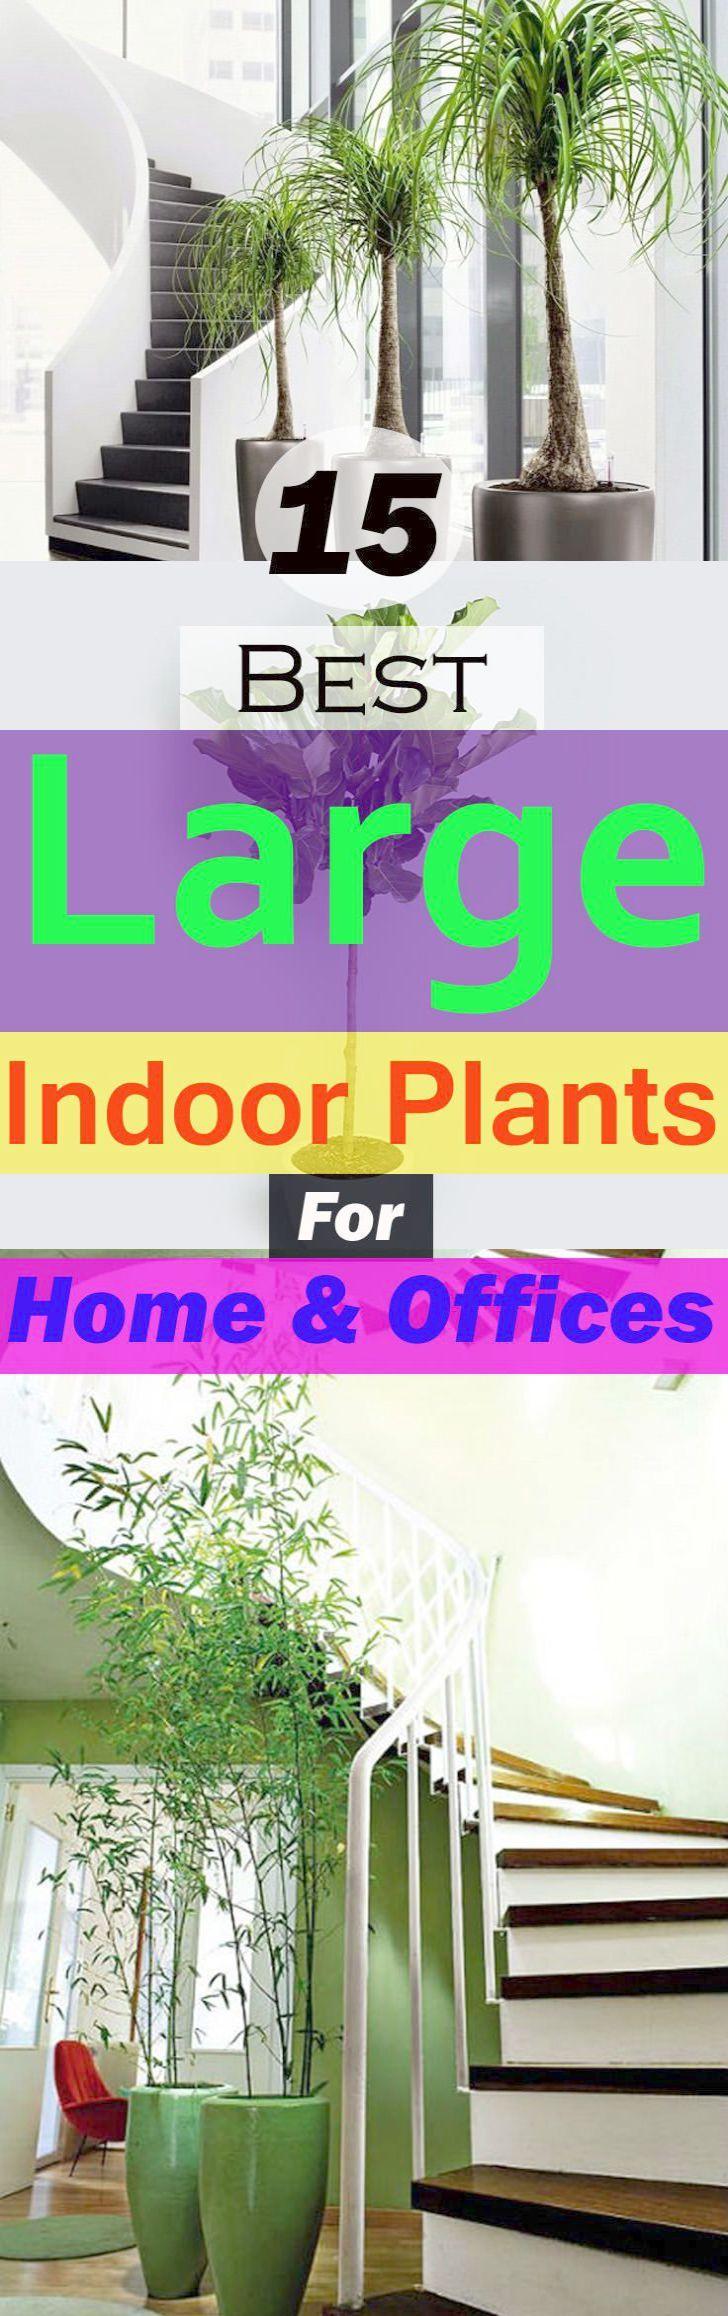 Gardening Classes Near Me; Kitchen Gardening For Beginners ...